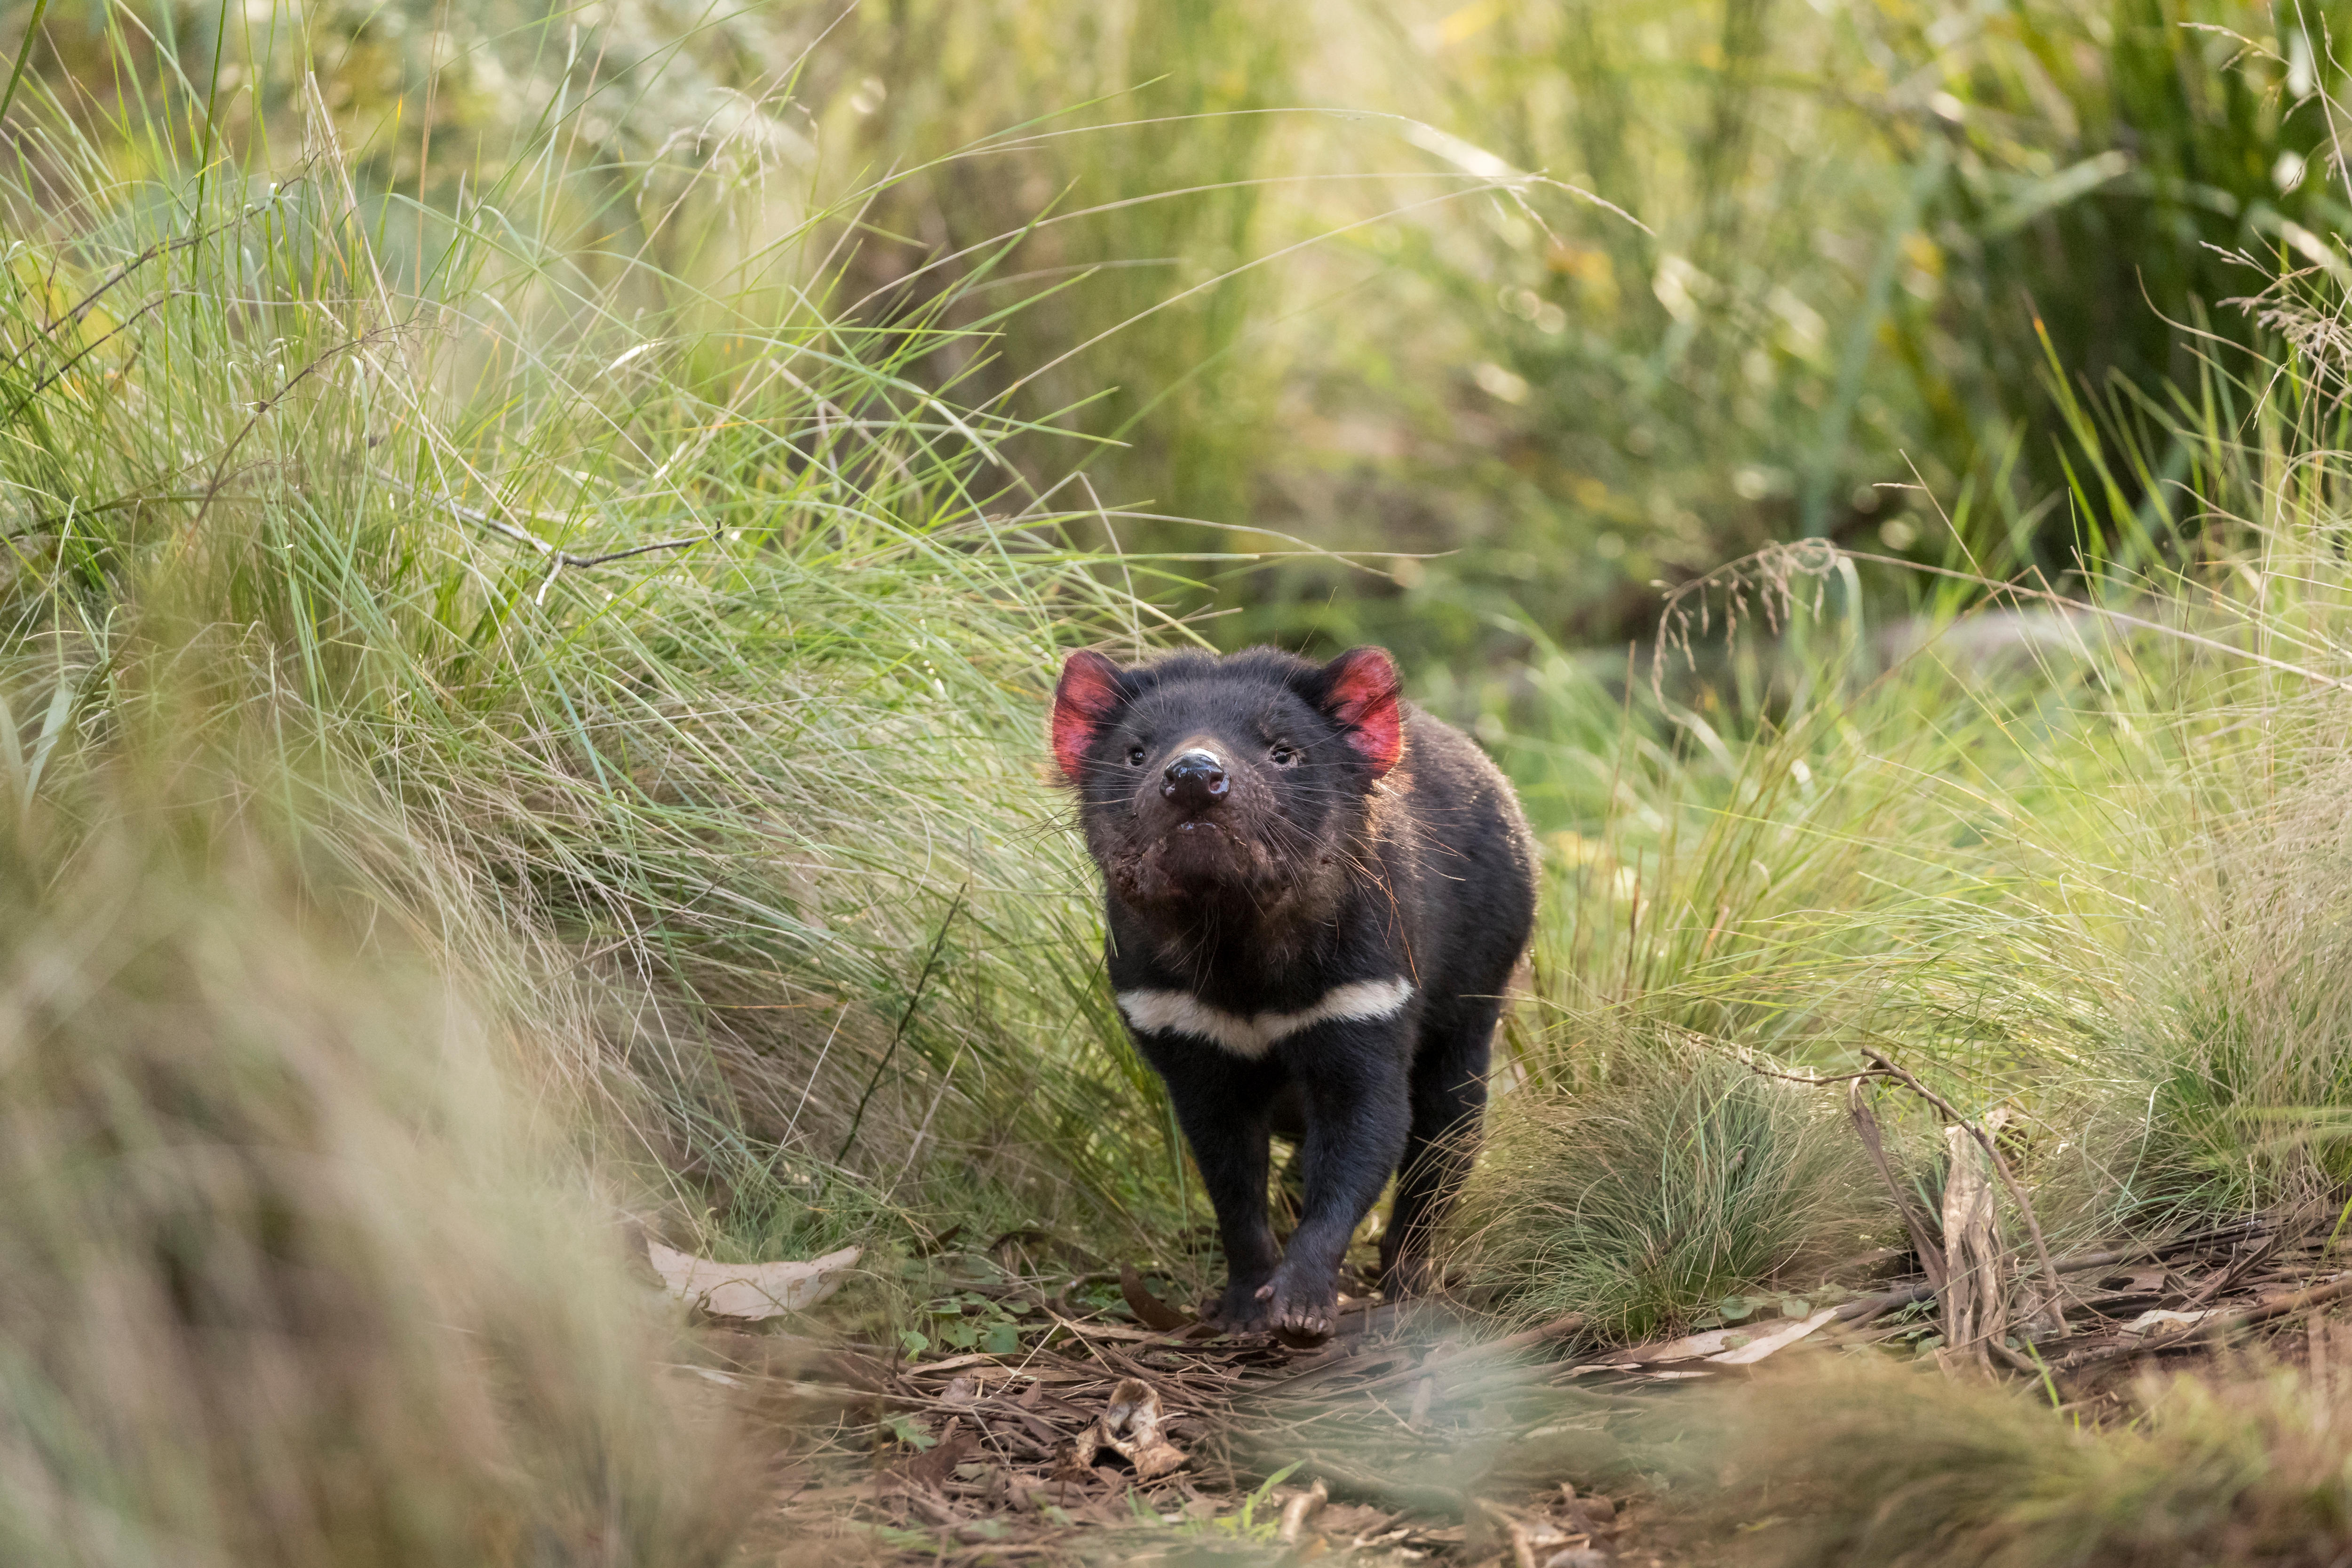 A Tasmanian devil in the bush.